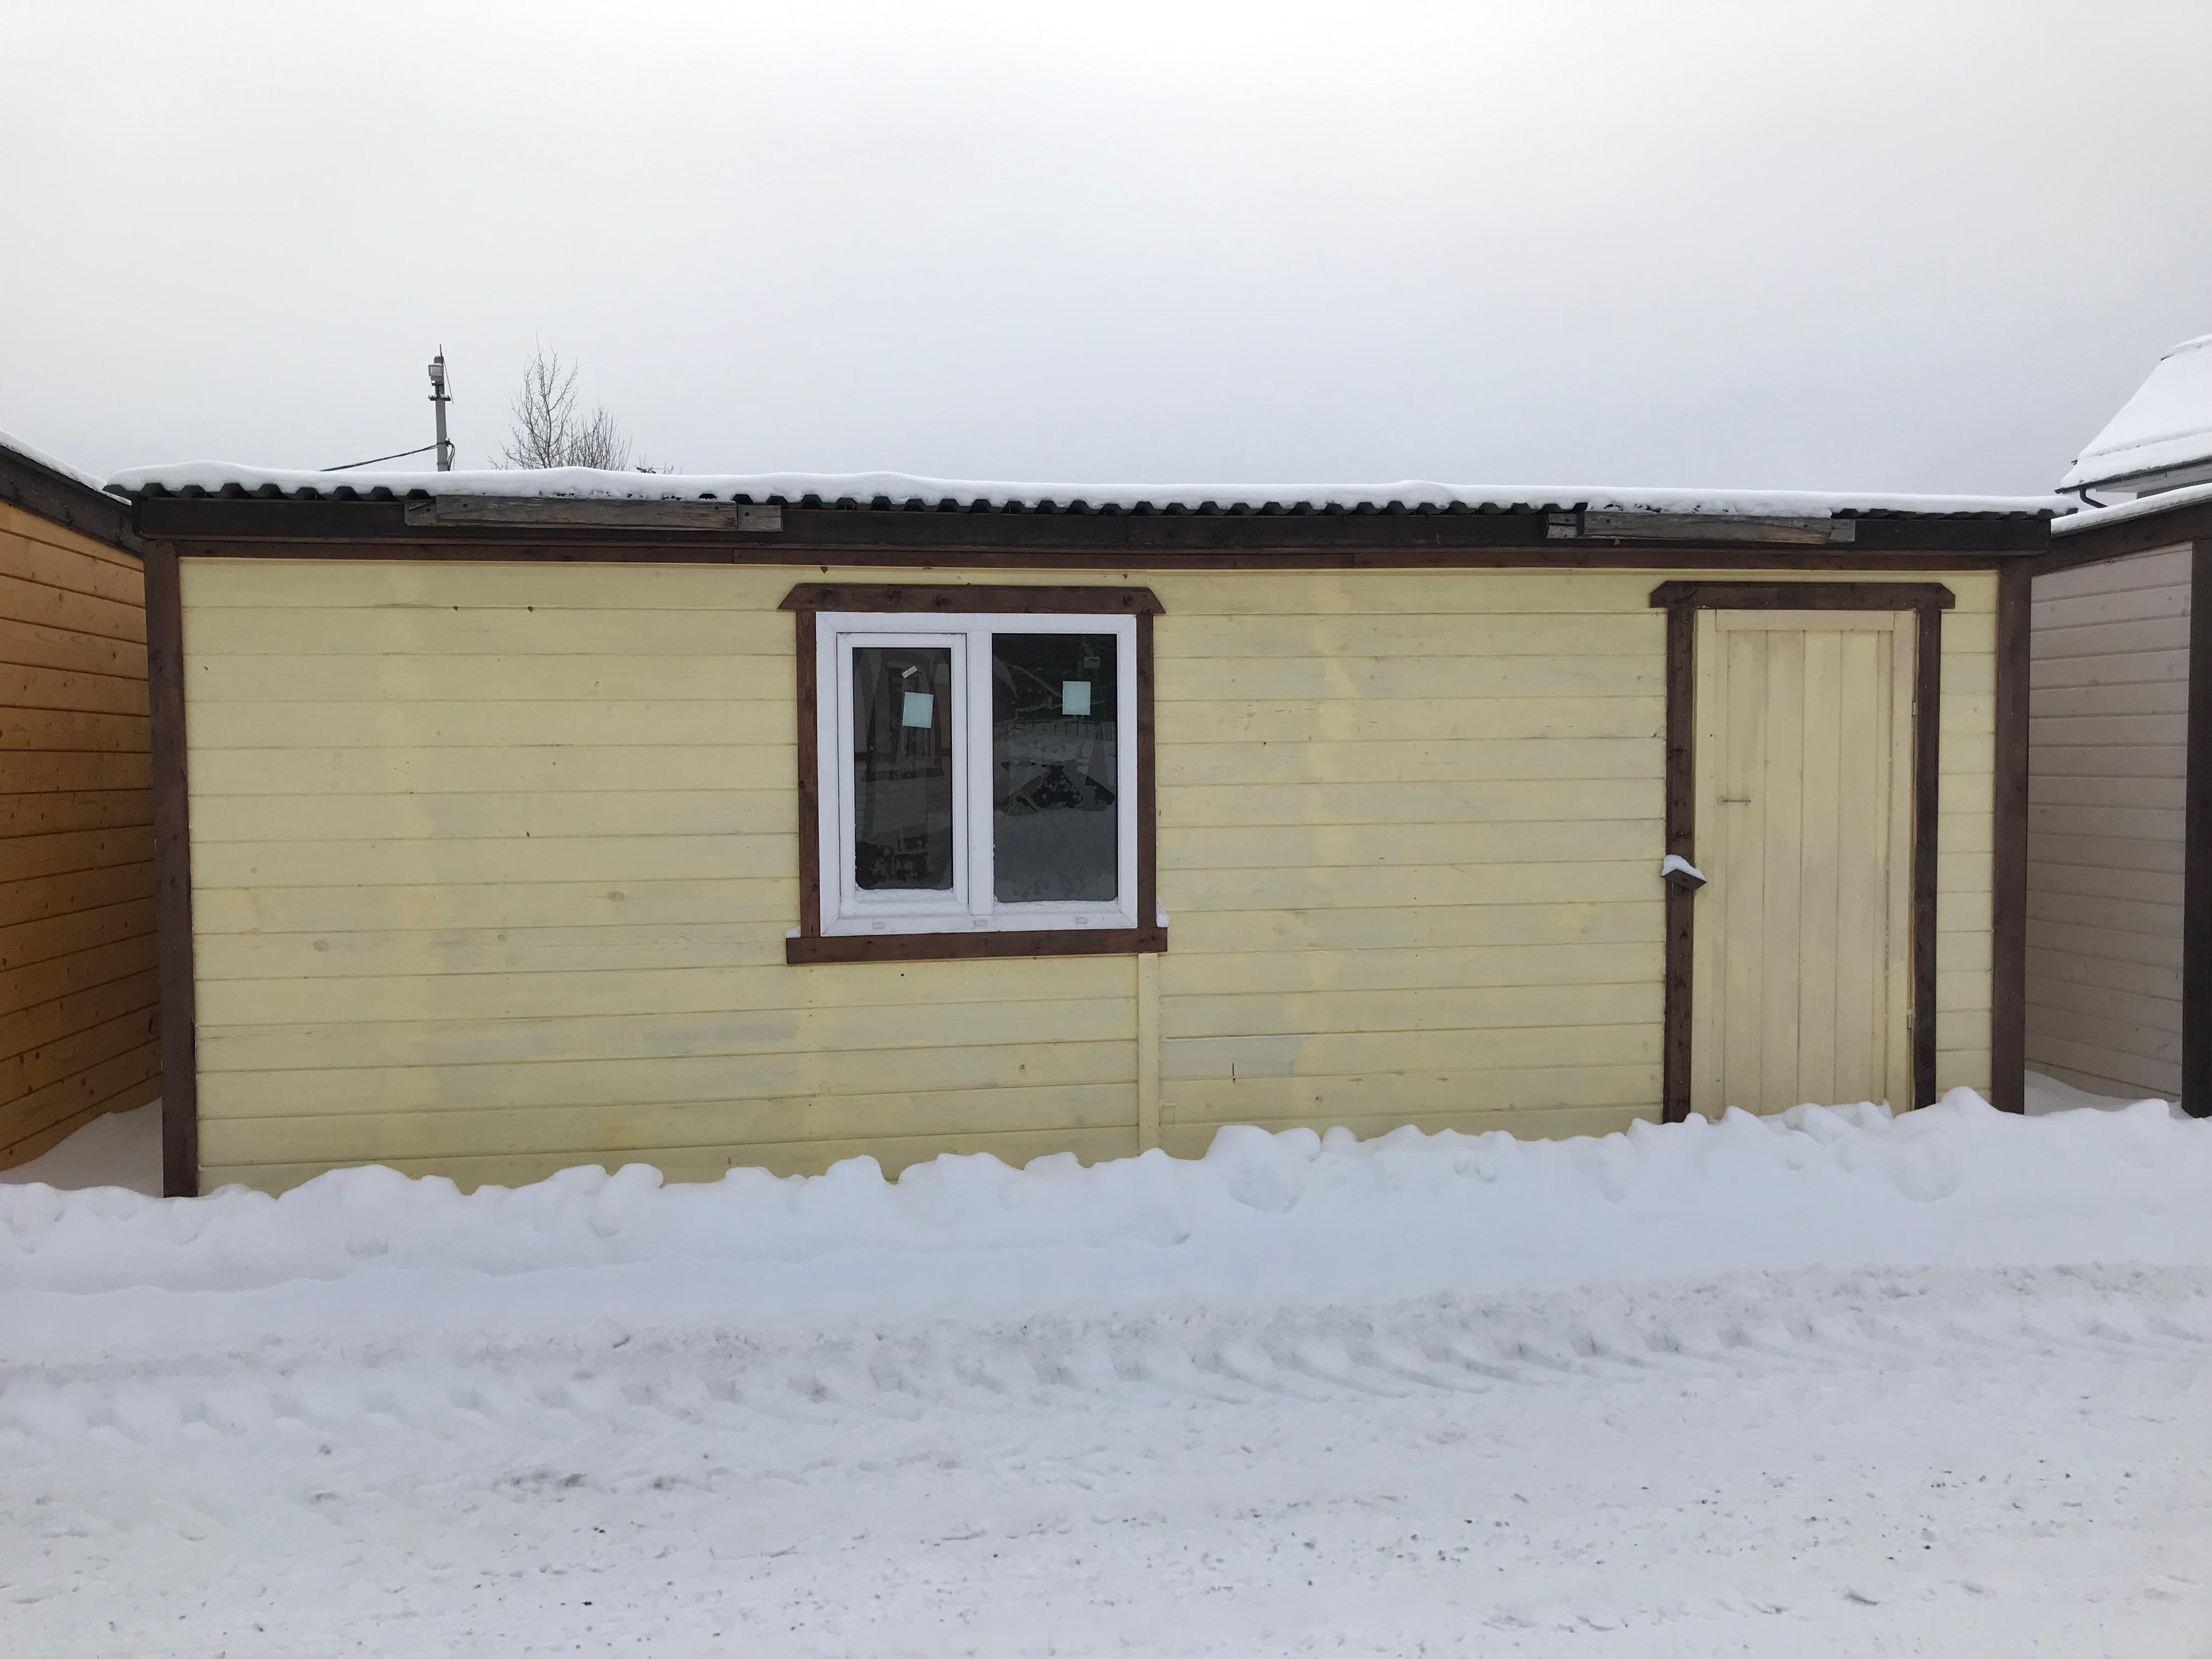 Деревянная бытовка для дачи БД-00 7x2,3 м